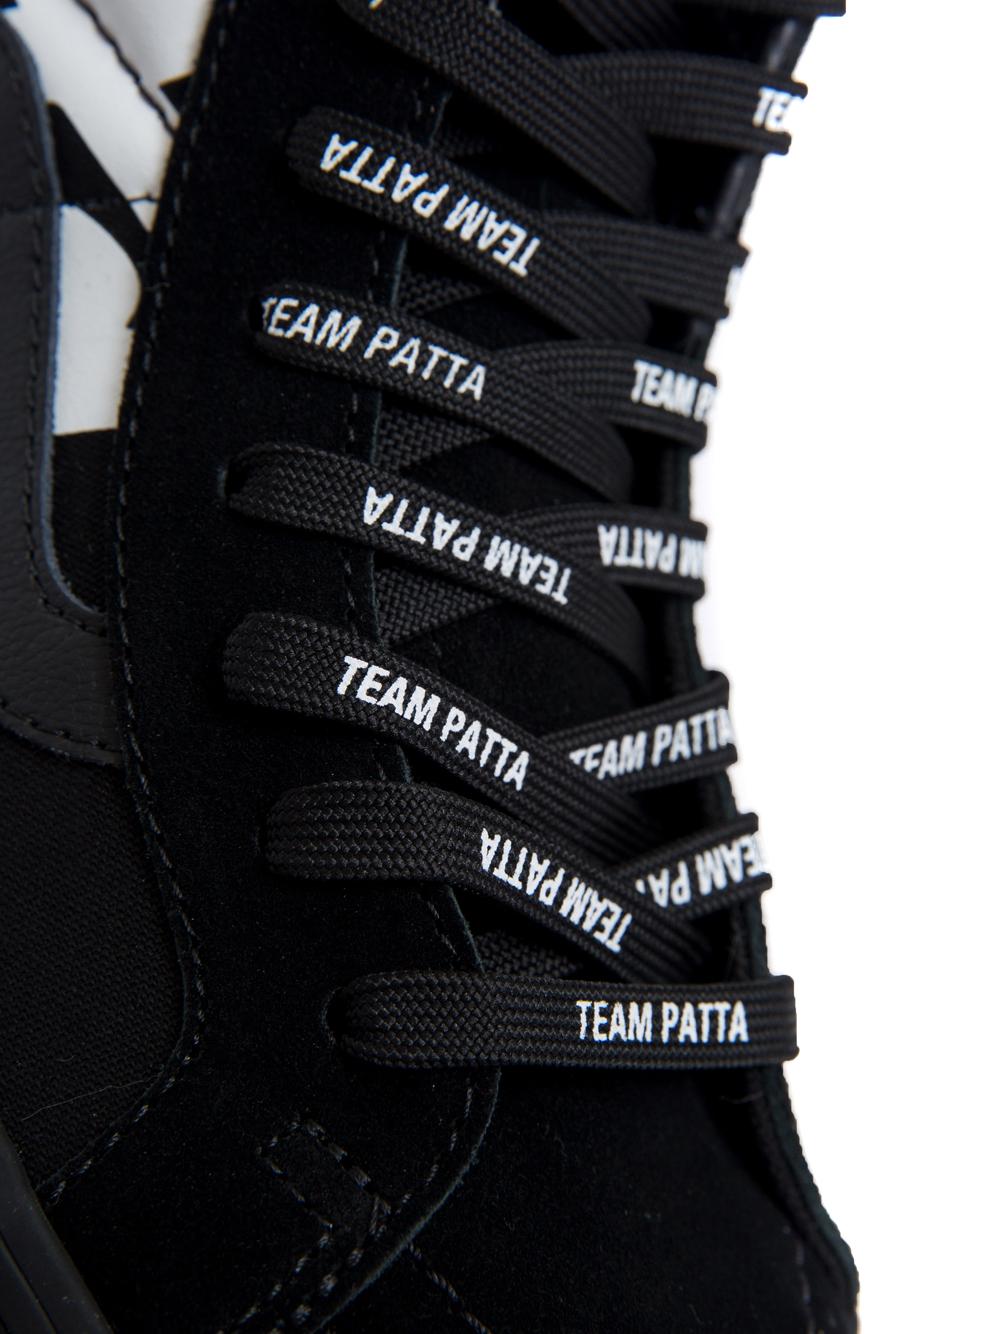 sneakers ua sk8 hi reissue vl unisex nere VANS VAULT X PATTA | Sneakers | VN0A4BVH5X01